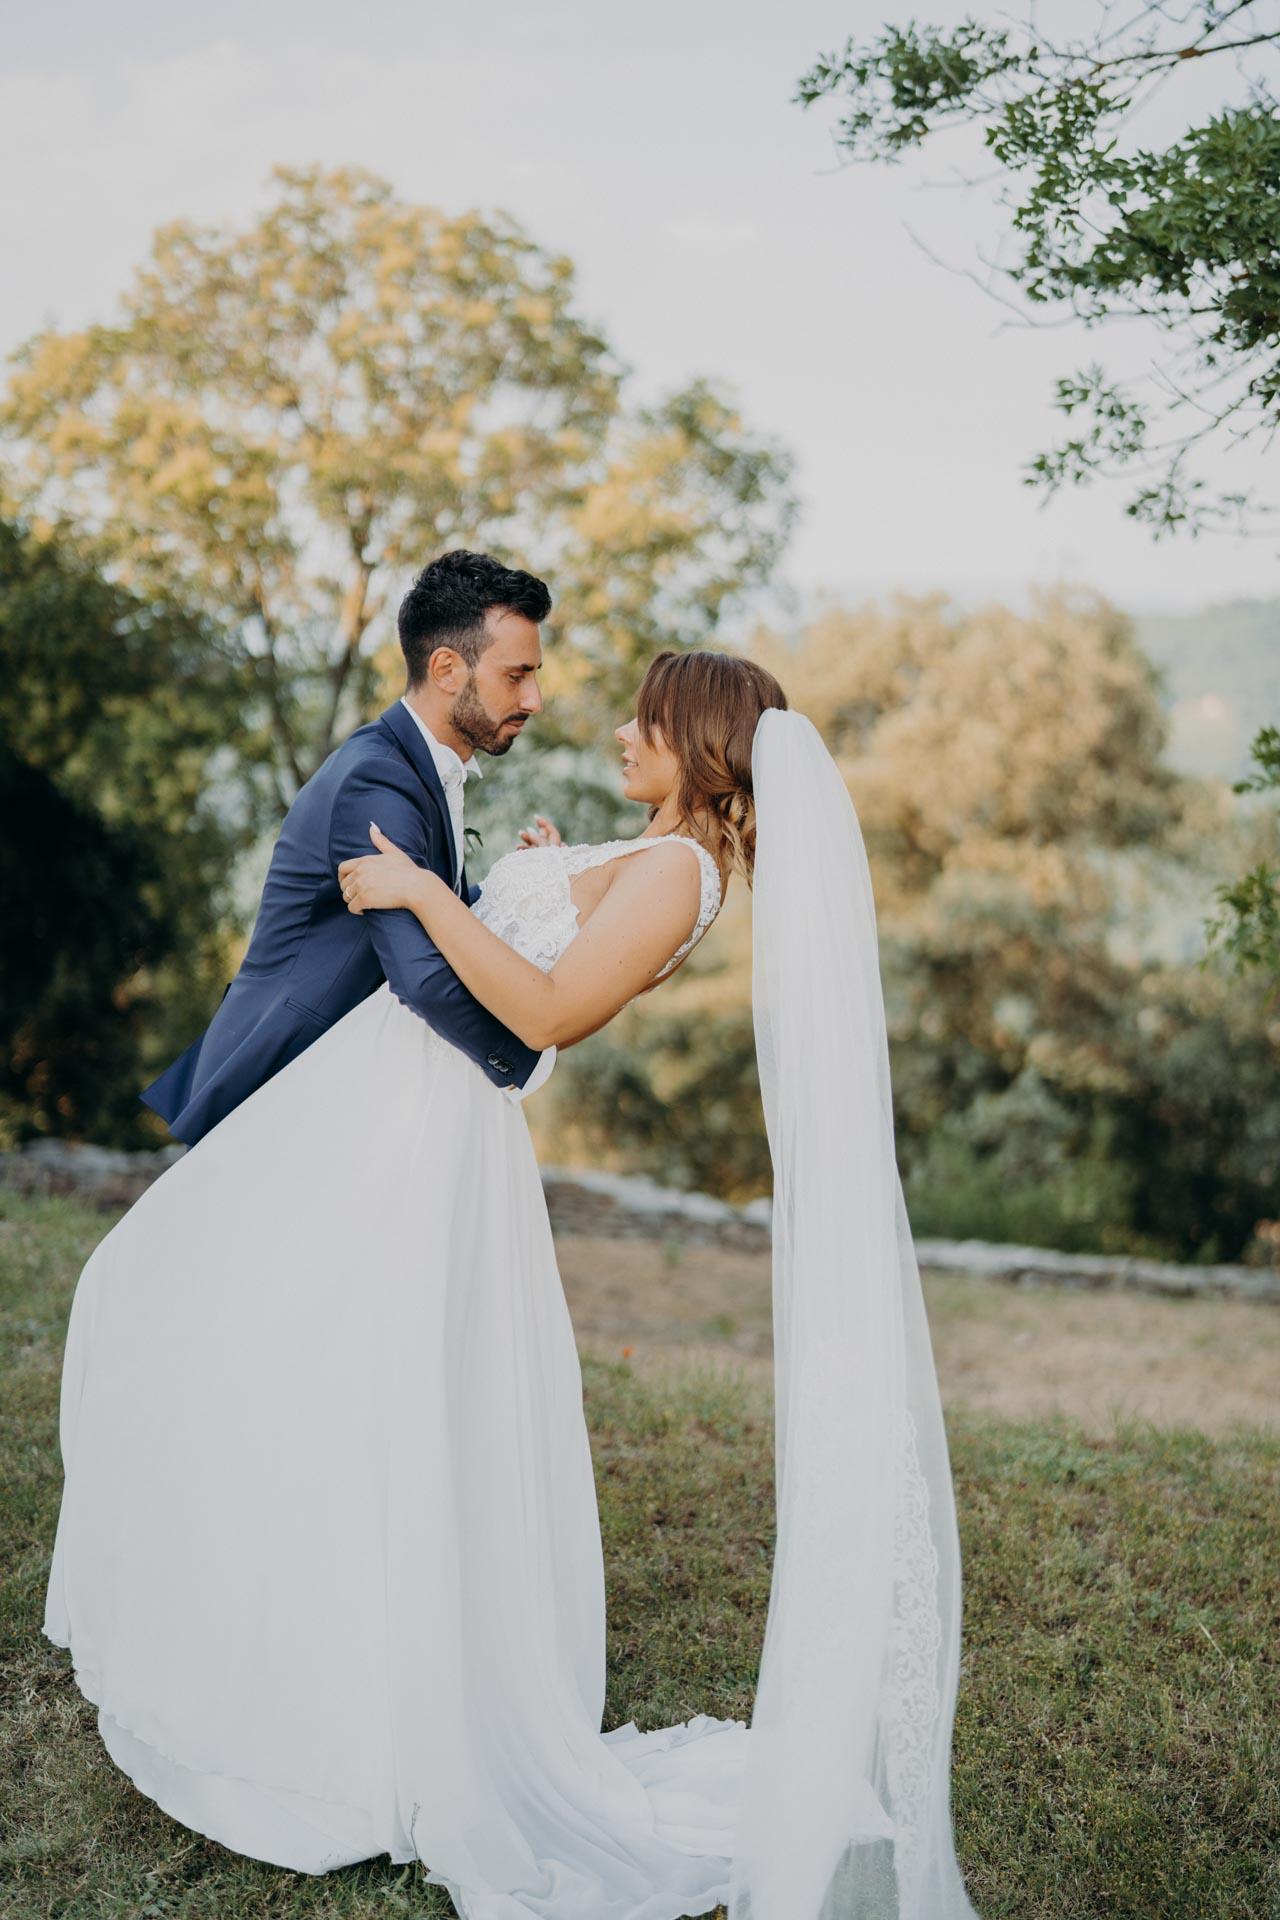 fotografo_matrimonio_toscana_poggio_tondo_67